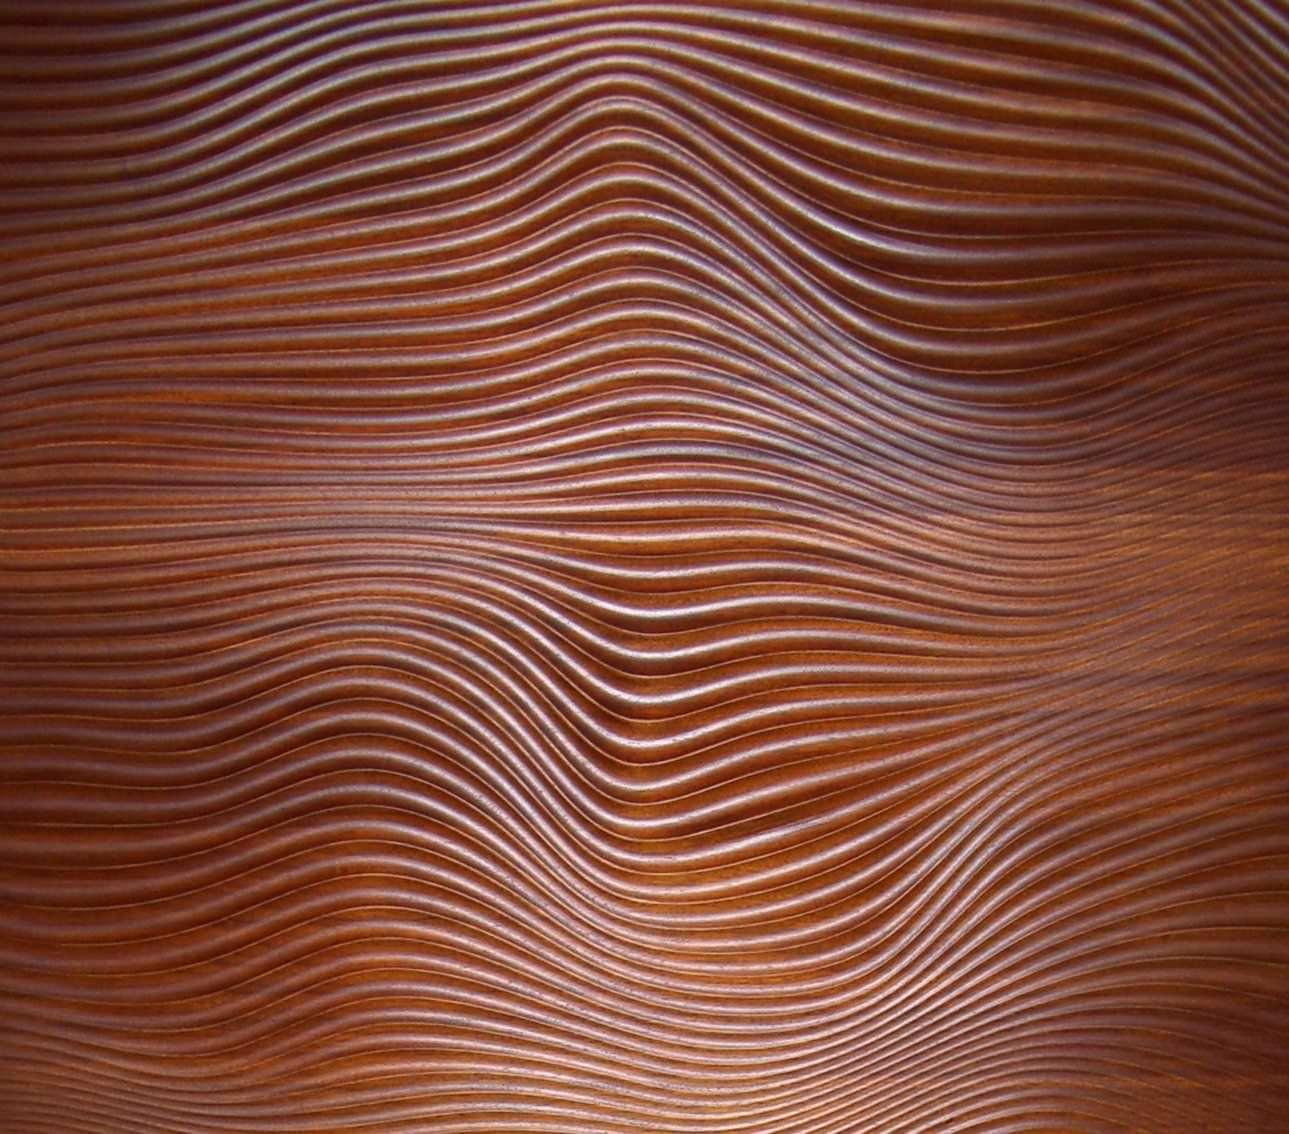 wooden decorative walls photo - 2